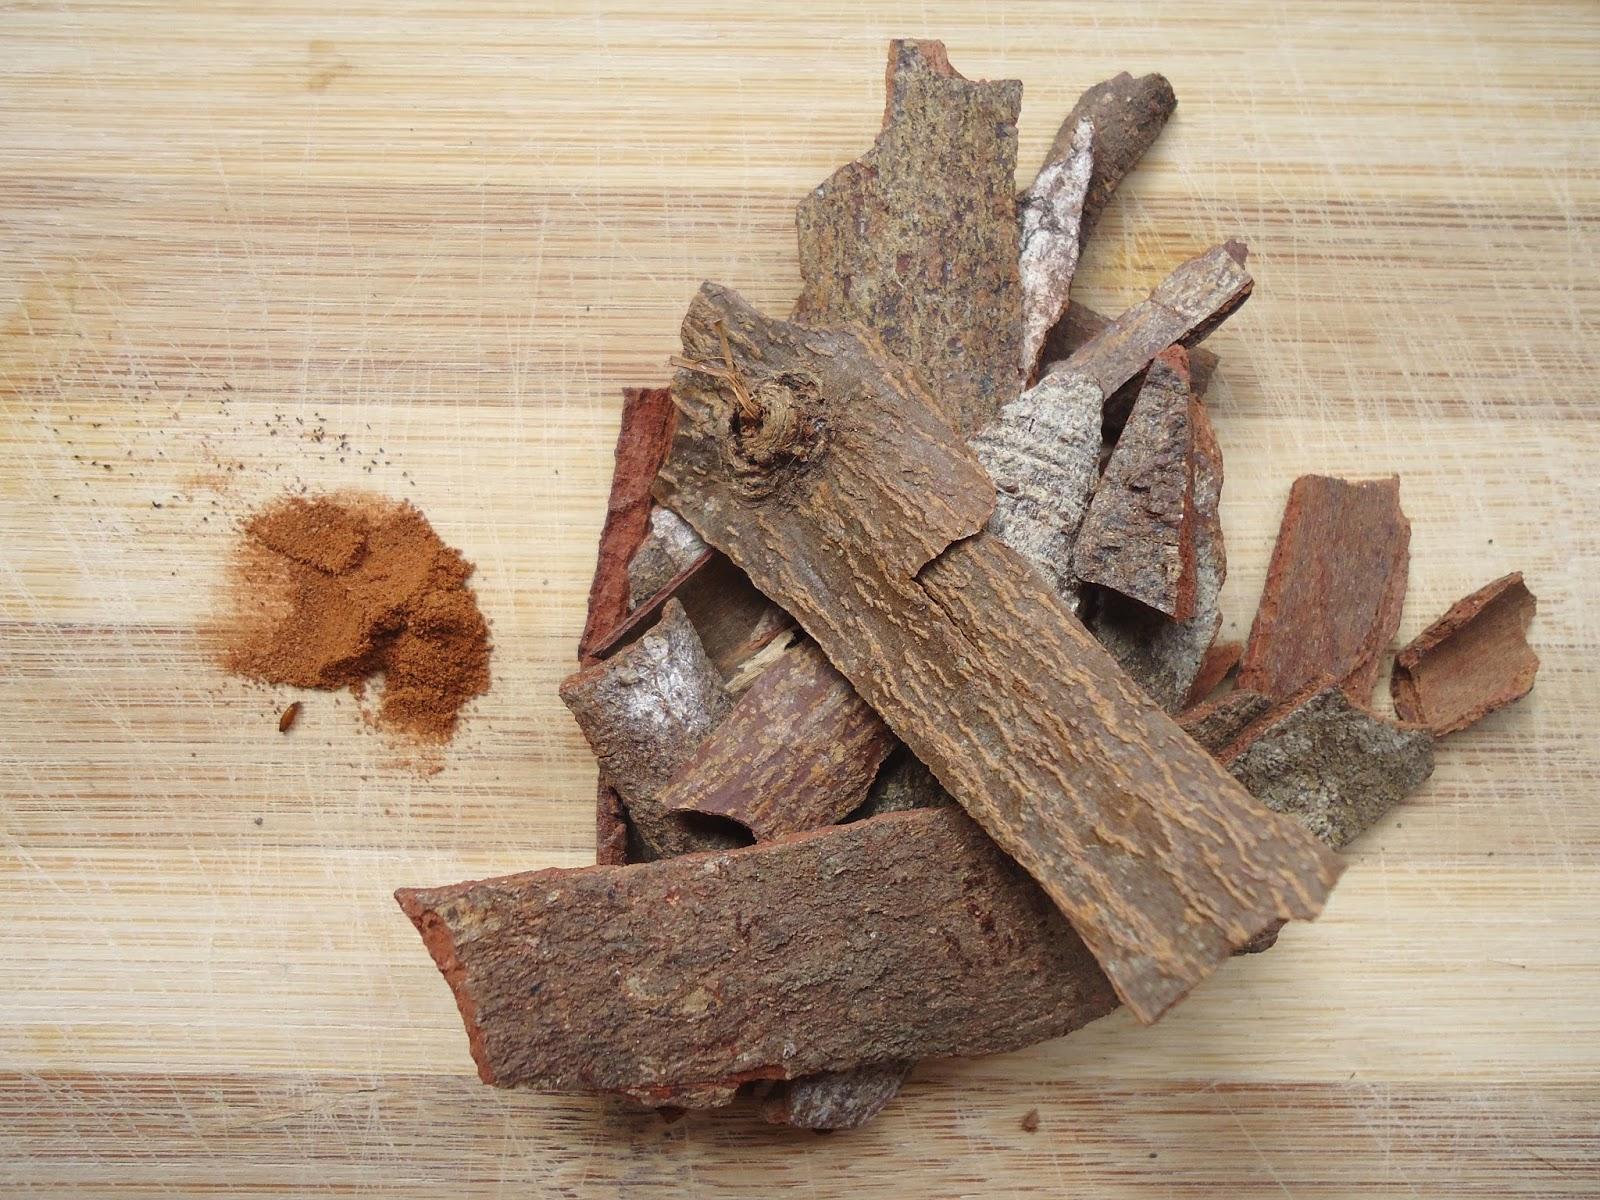 cinnamon bark and powder